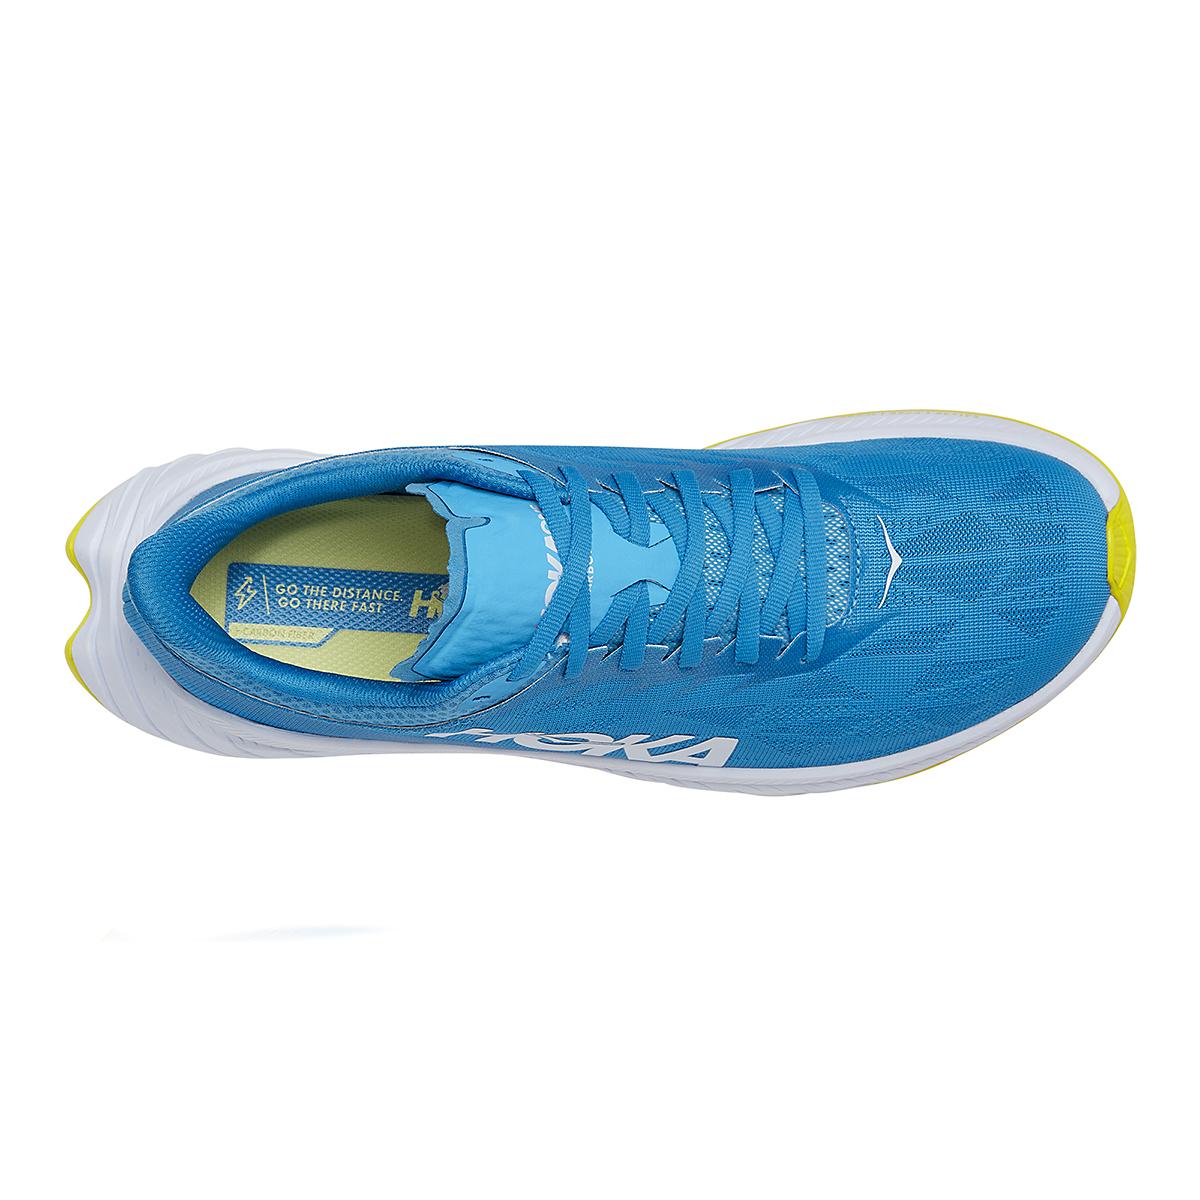 Men's Hoka One One Carbon X 2 Running Shoe - Color: Diva Blue/Citron - Size: 7 - Width: Regular, Diva Blue/Citron, large, image 5